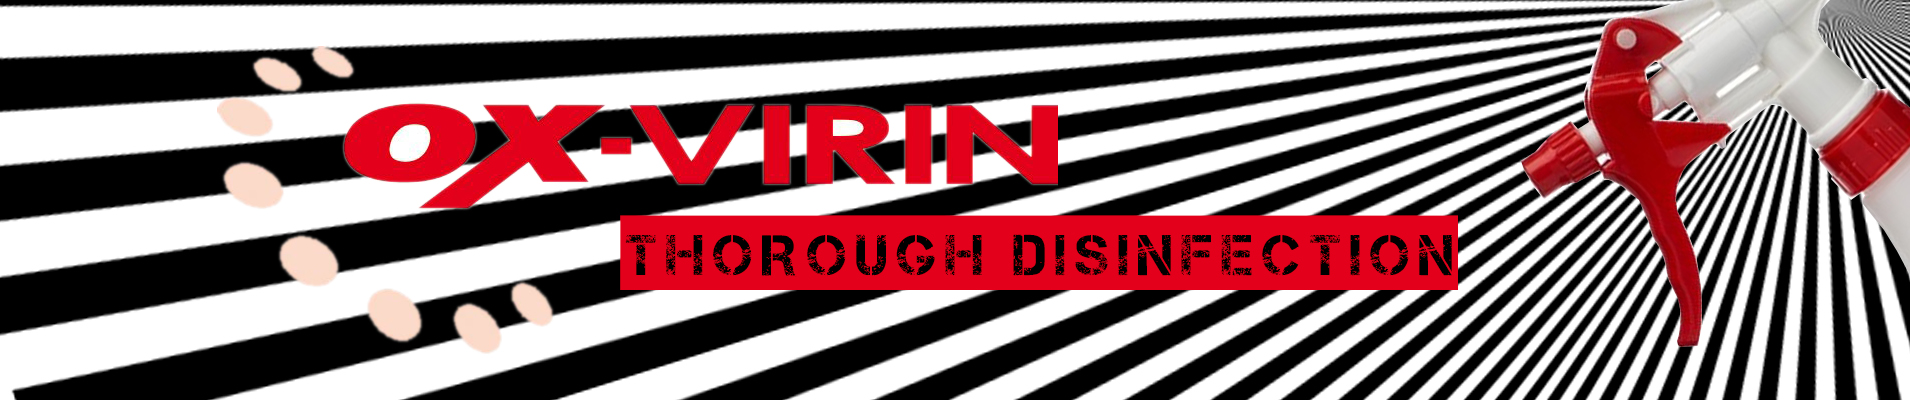 EN-OX-VIRIN-Surface disinfectant